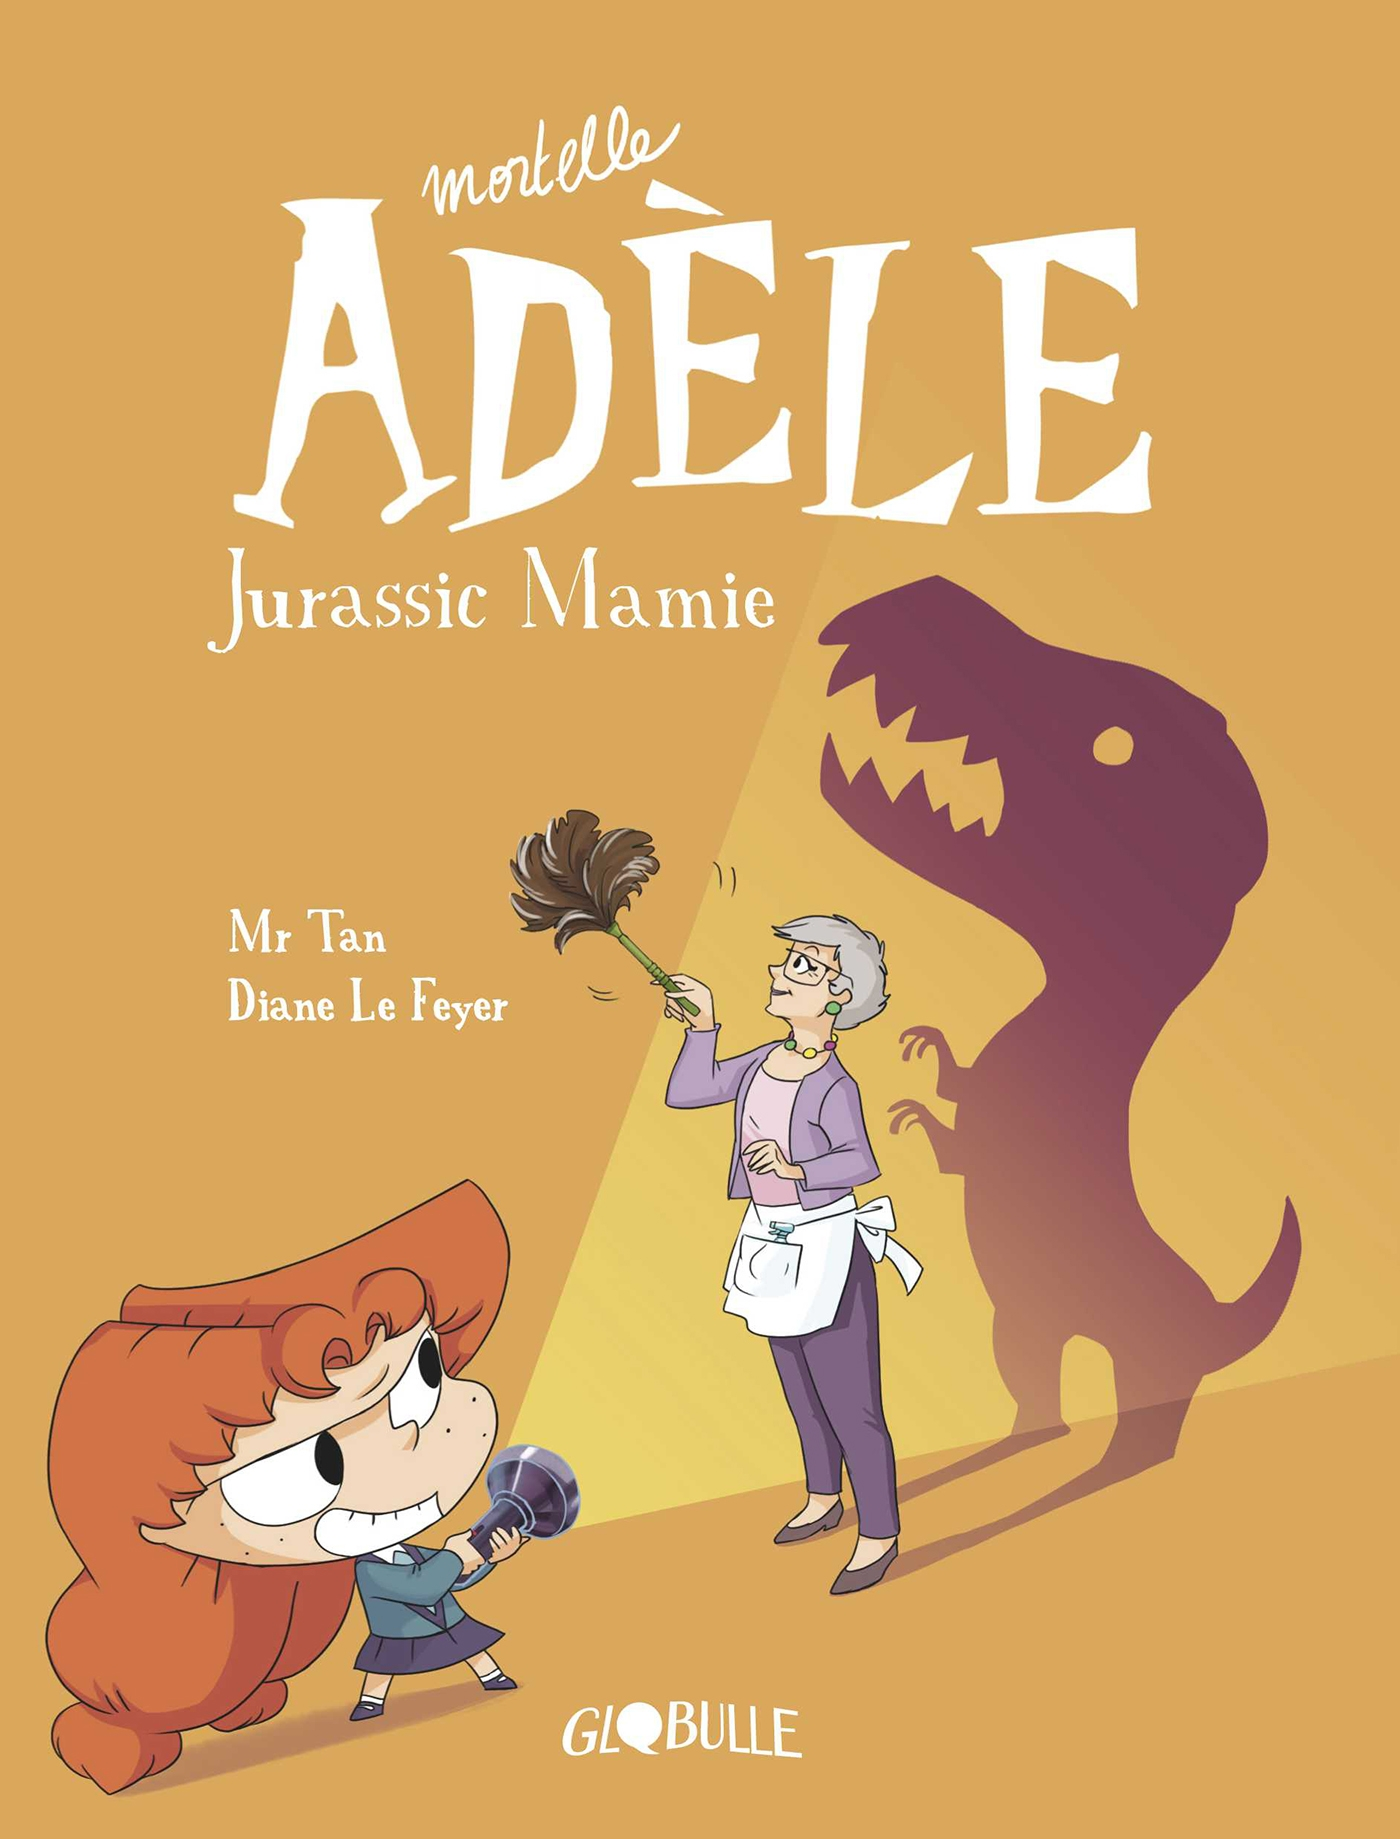 Mortelle Adèle 16 - Jurassic Mamie